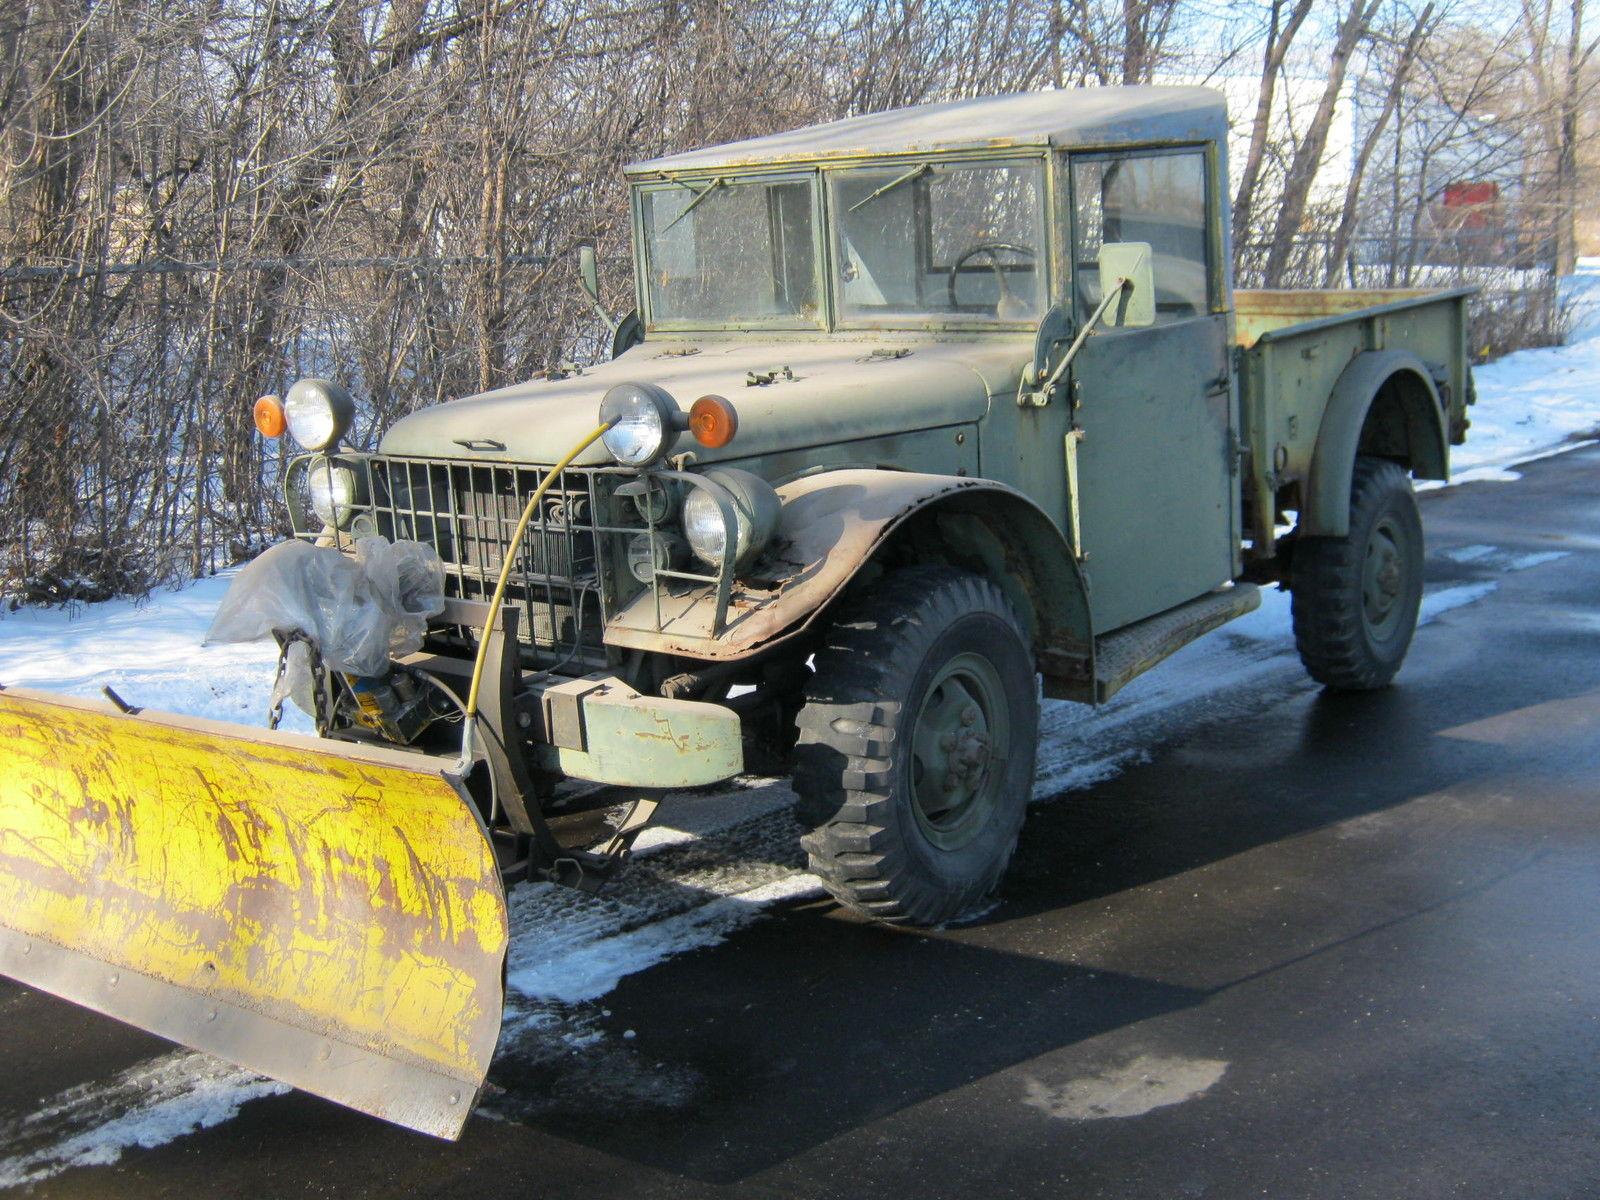 1952 Dodge Powerwagon Military Truck For Sale In Waukesha Wisconsin 1954 Power Wagon